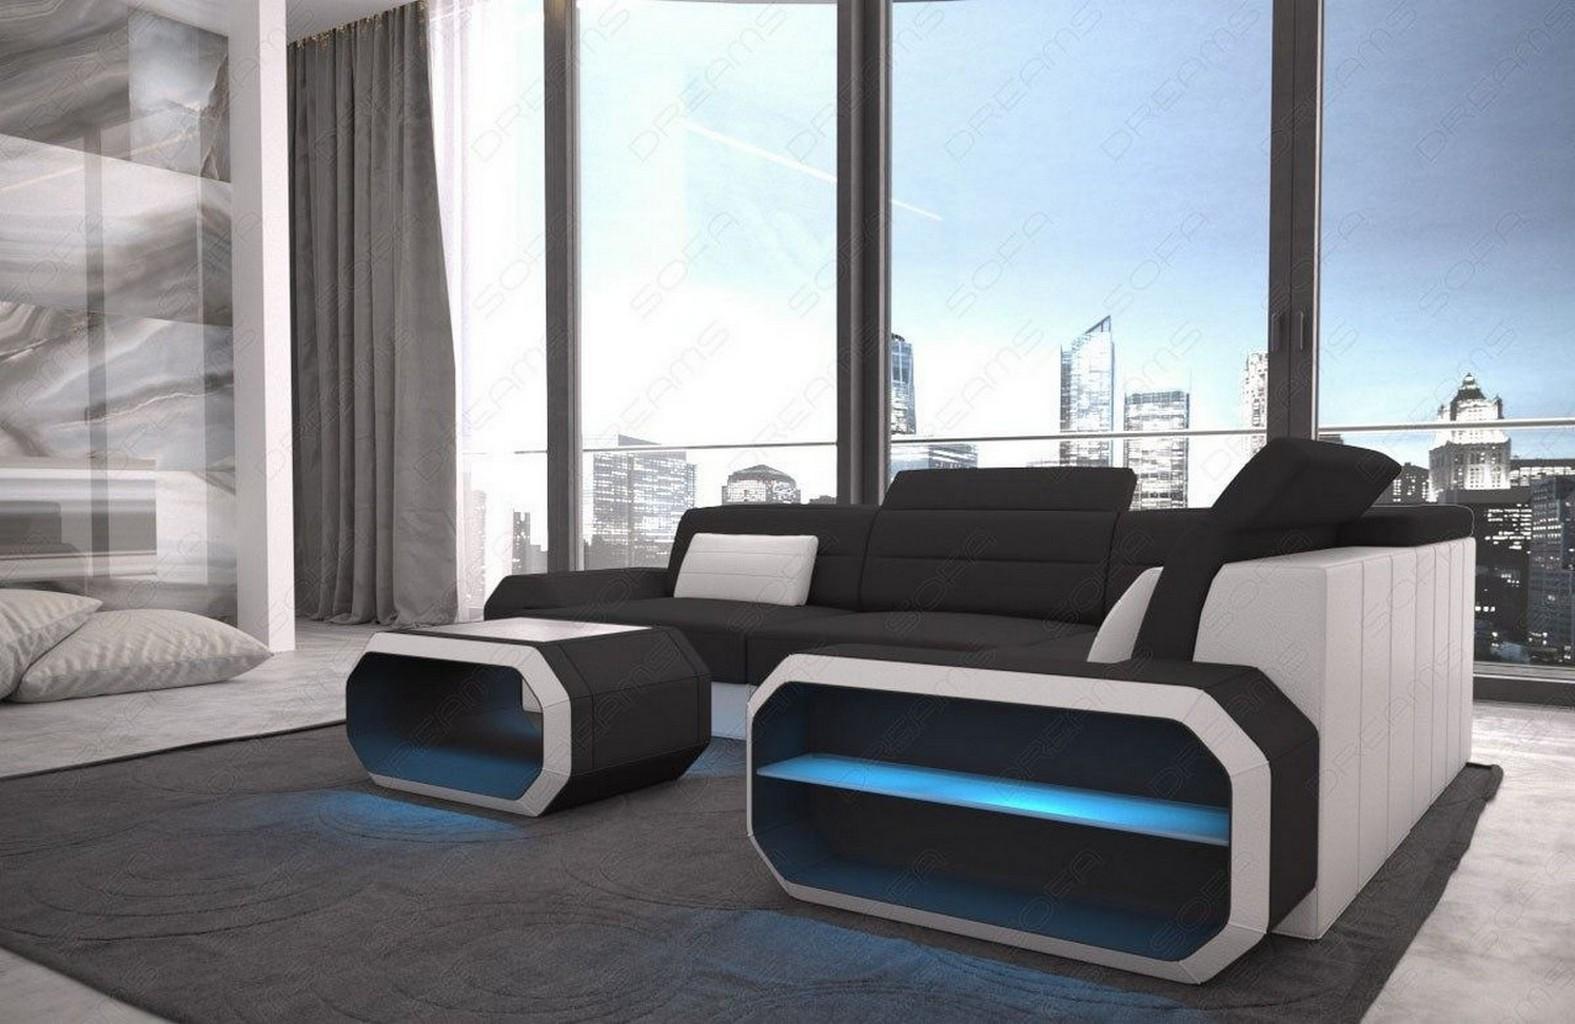 luxus design ecksofa stoff couch verona l form ottomane. Black Bedroom Furniture Sets. Home Design Ideas